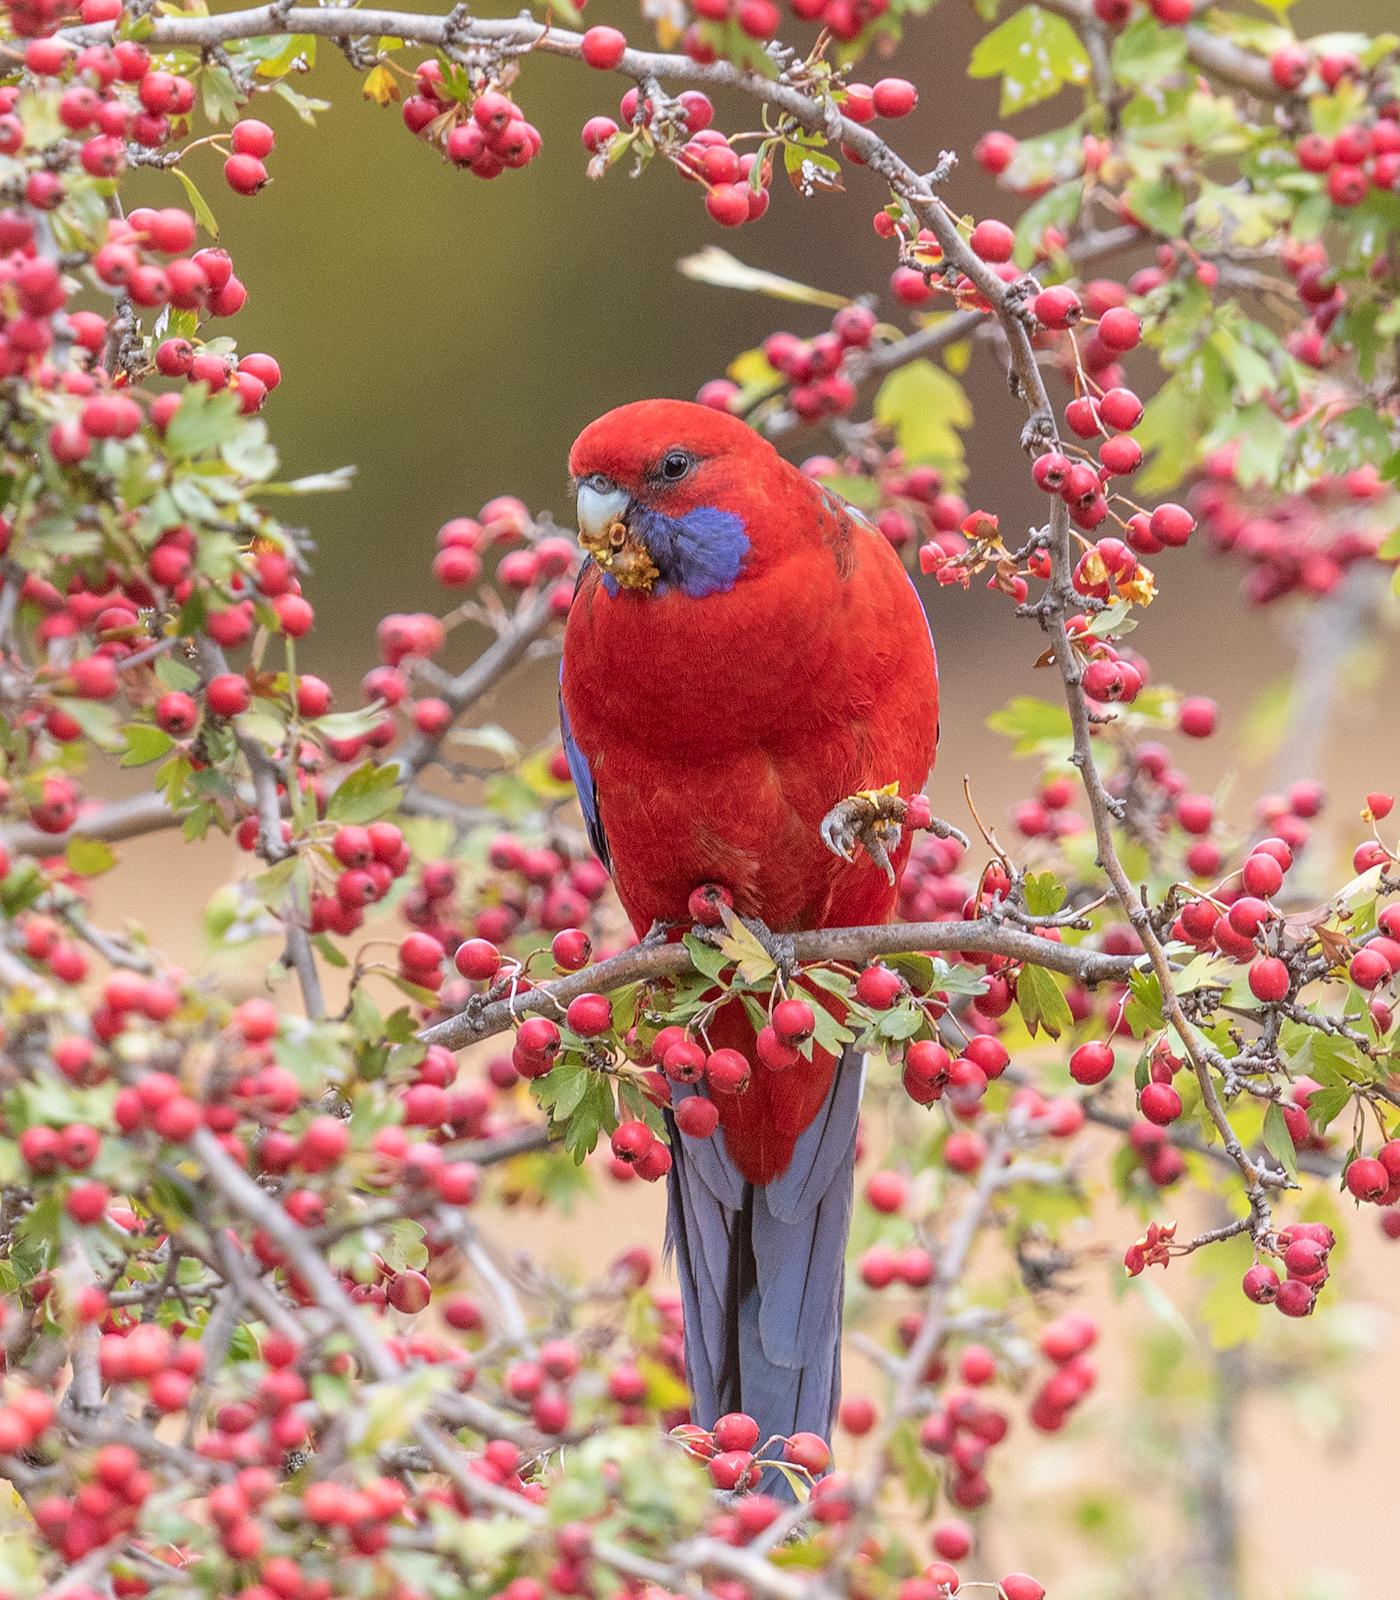 Hawthorn parrot